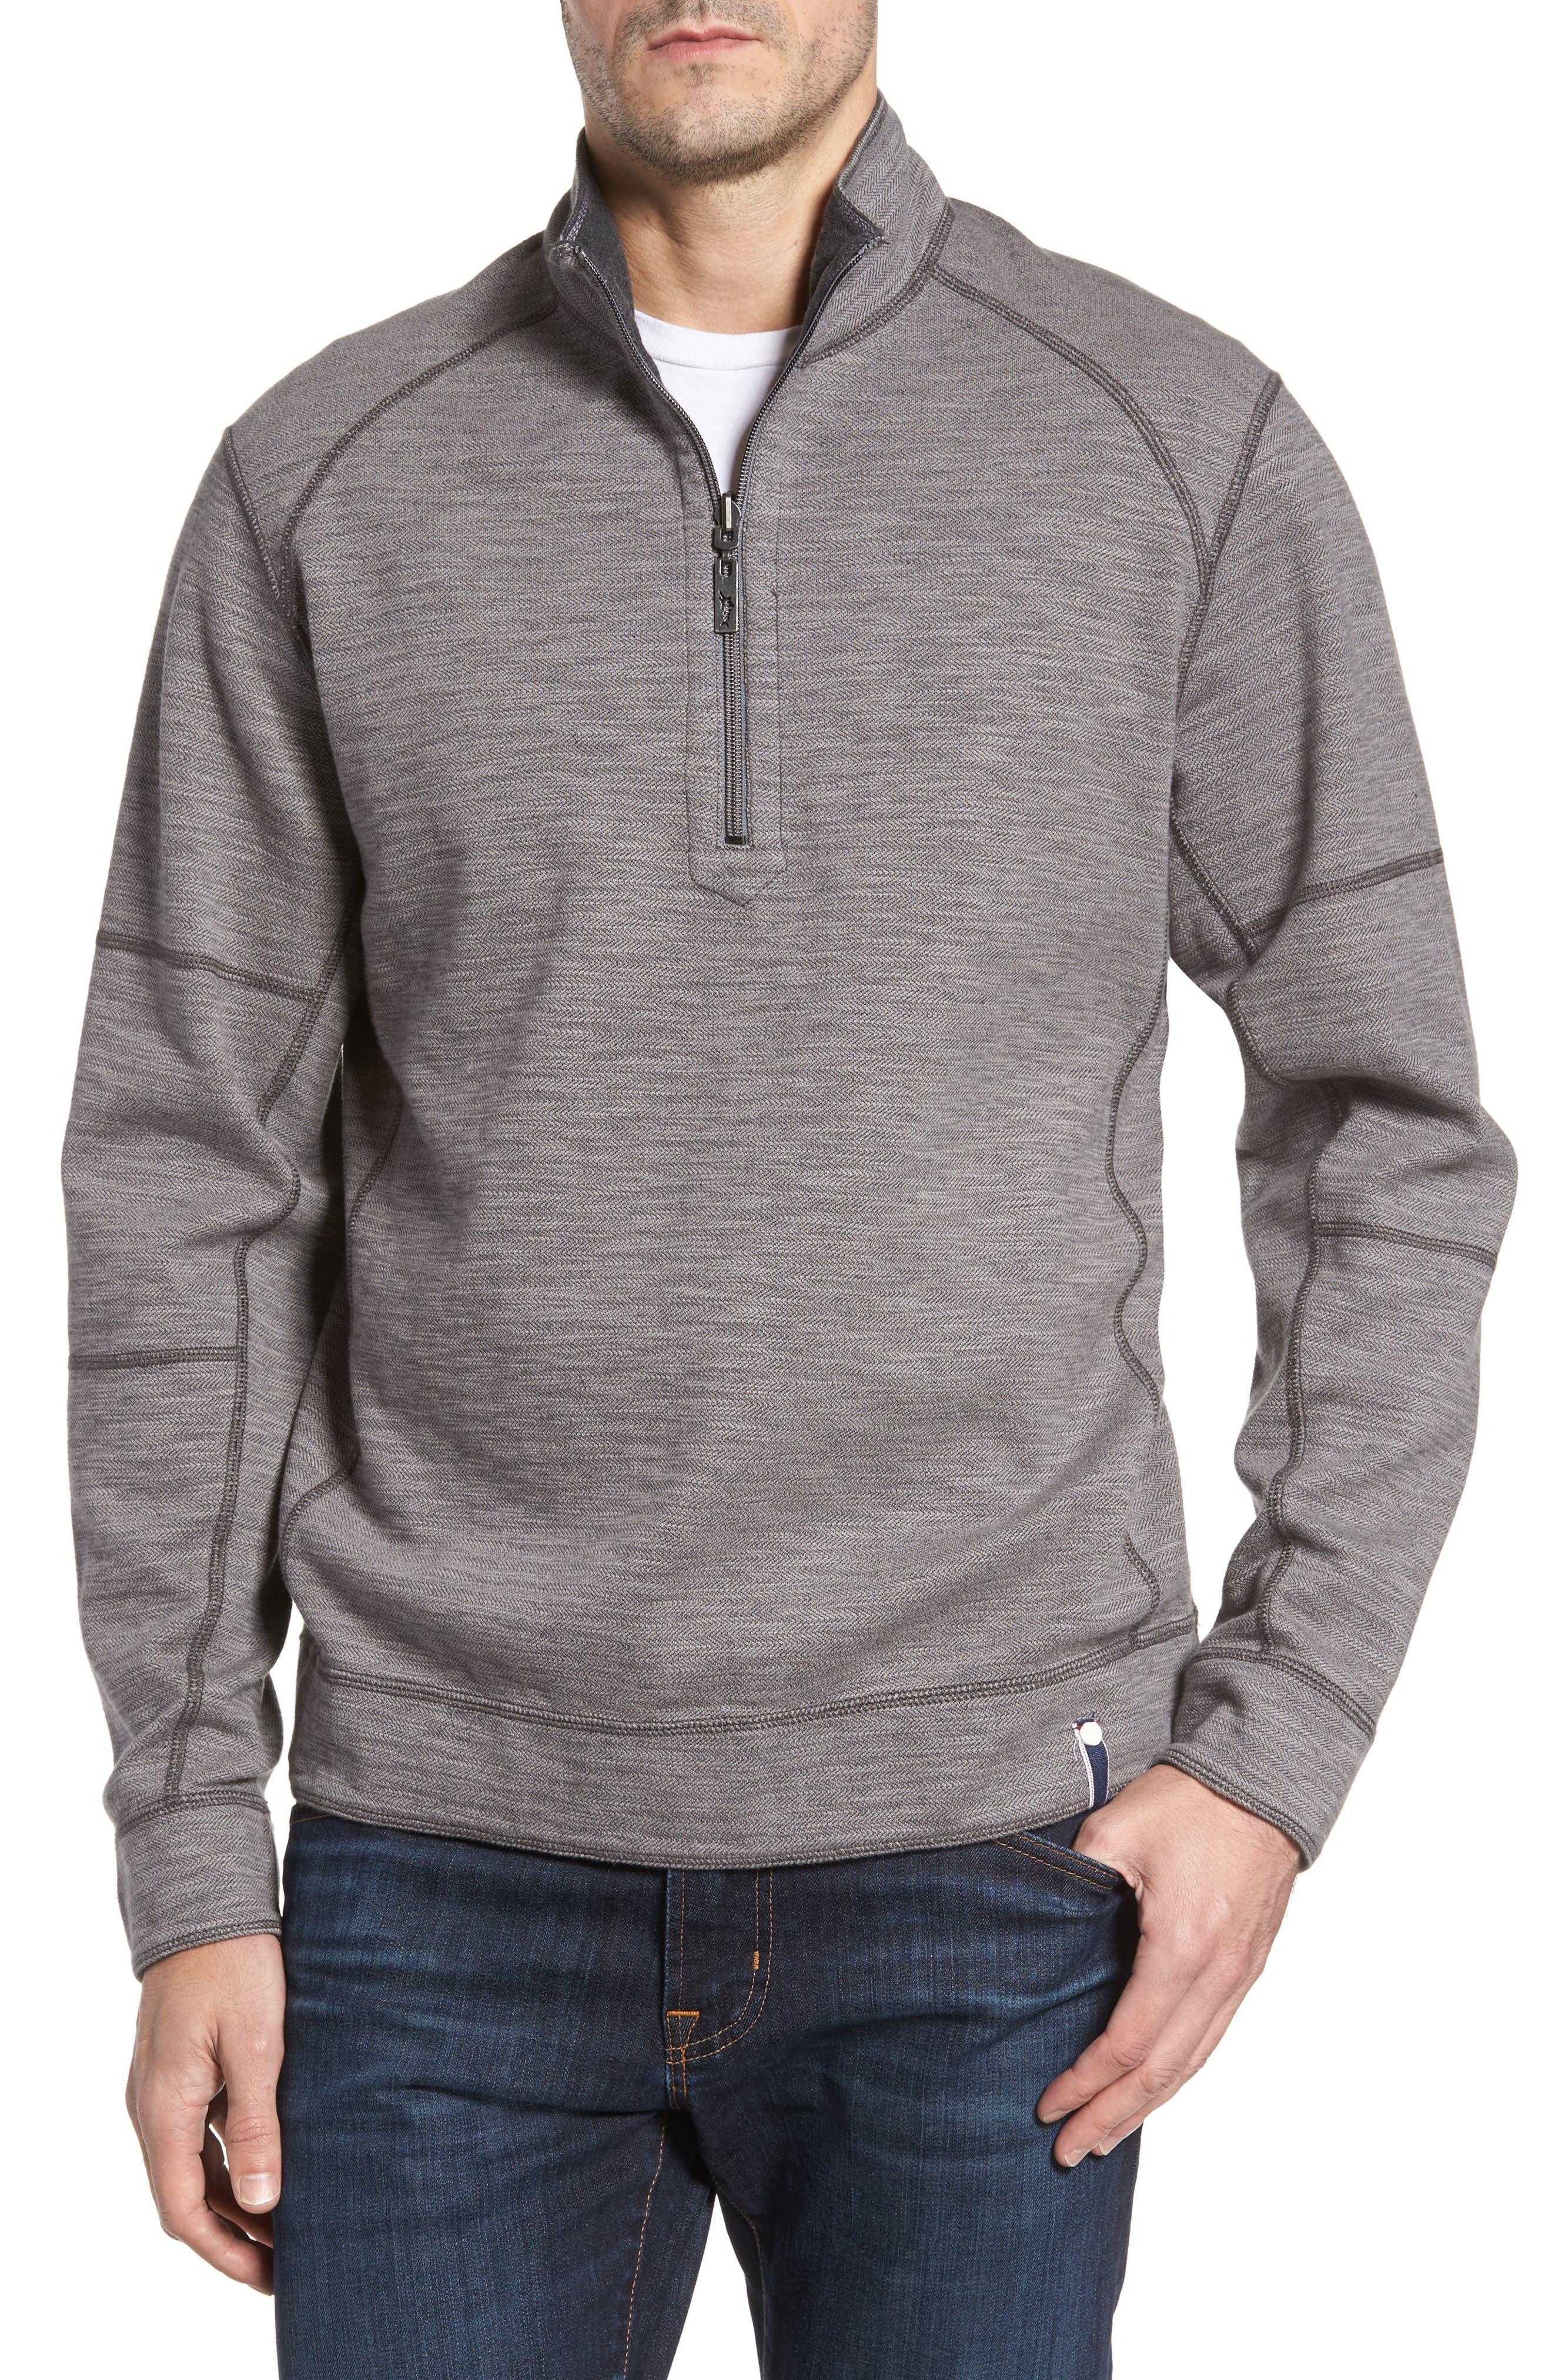 Sandbar Slub Reversible Quarter Zip Pullover,                         Main,                         color, Charcoal Heather